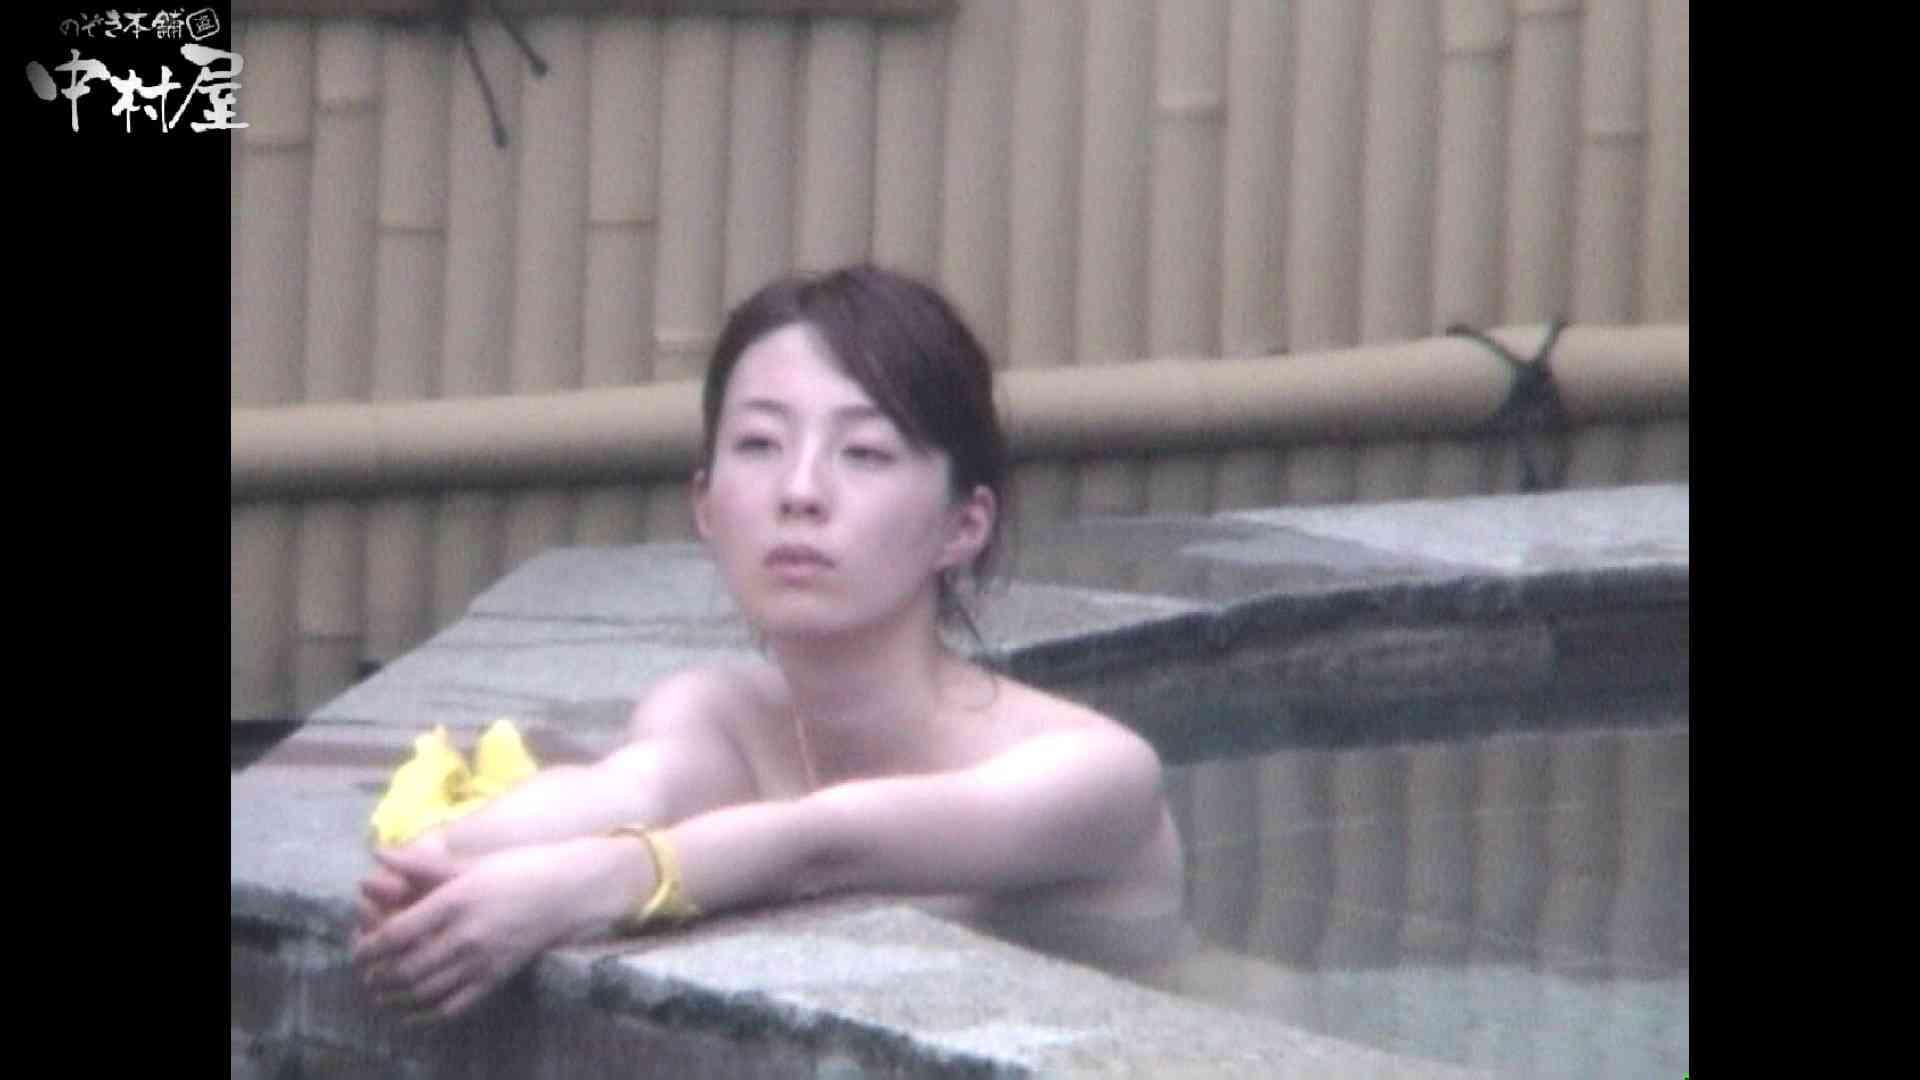 Aquaな露天風呂Vol.964 露天風呂編  112PIX 102